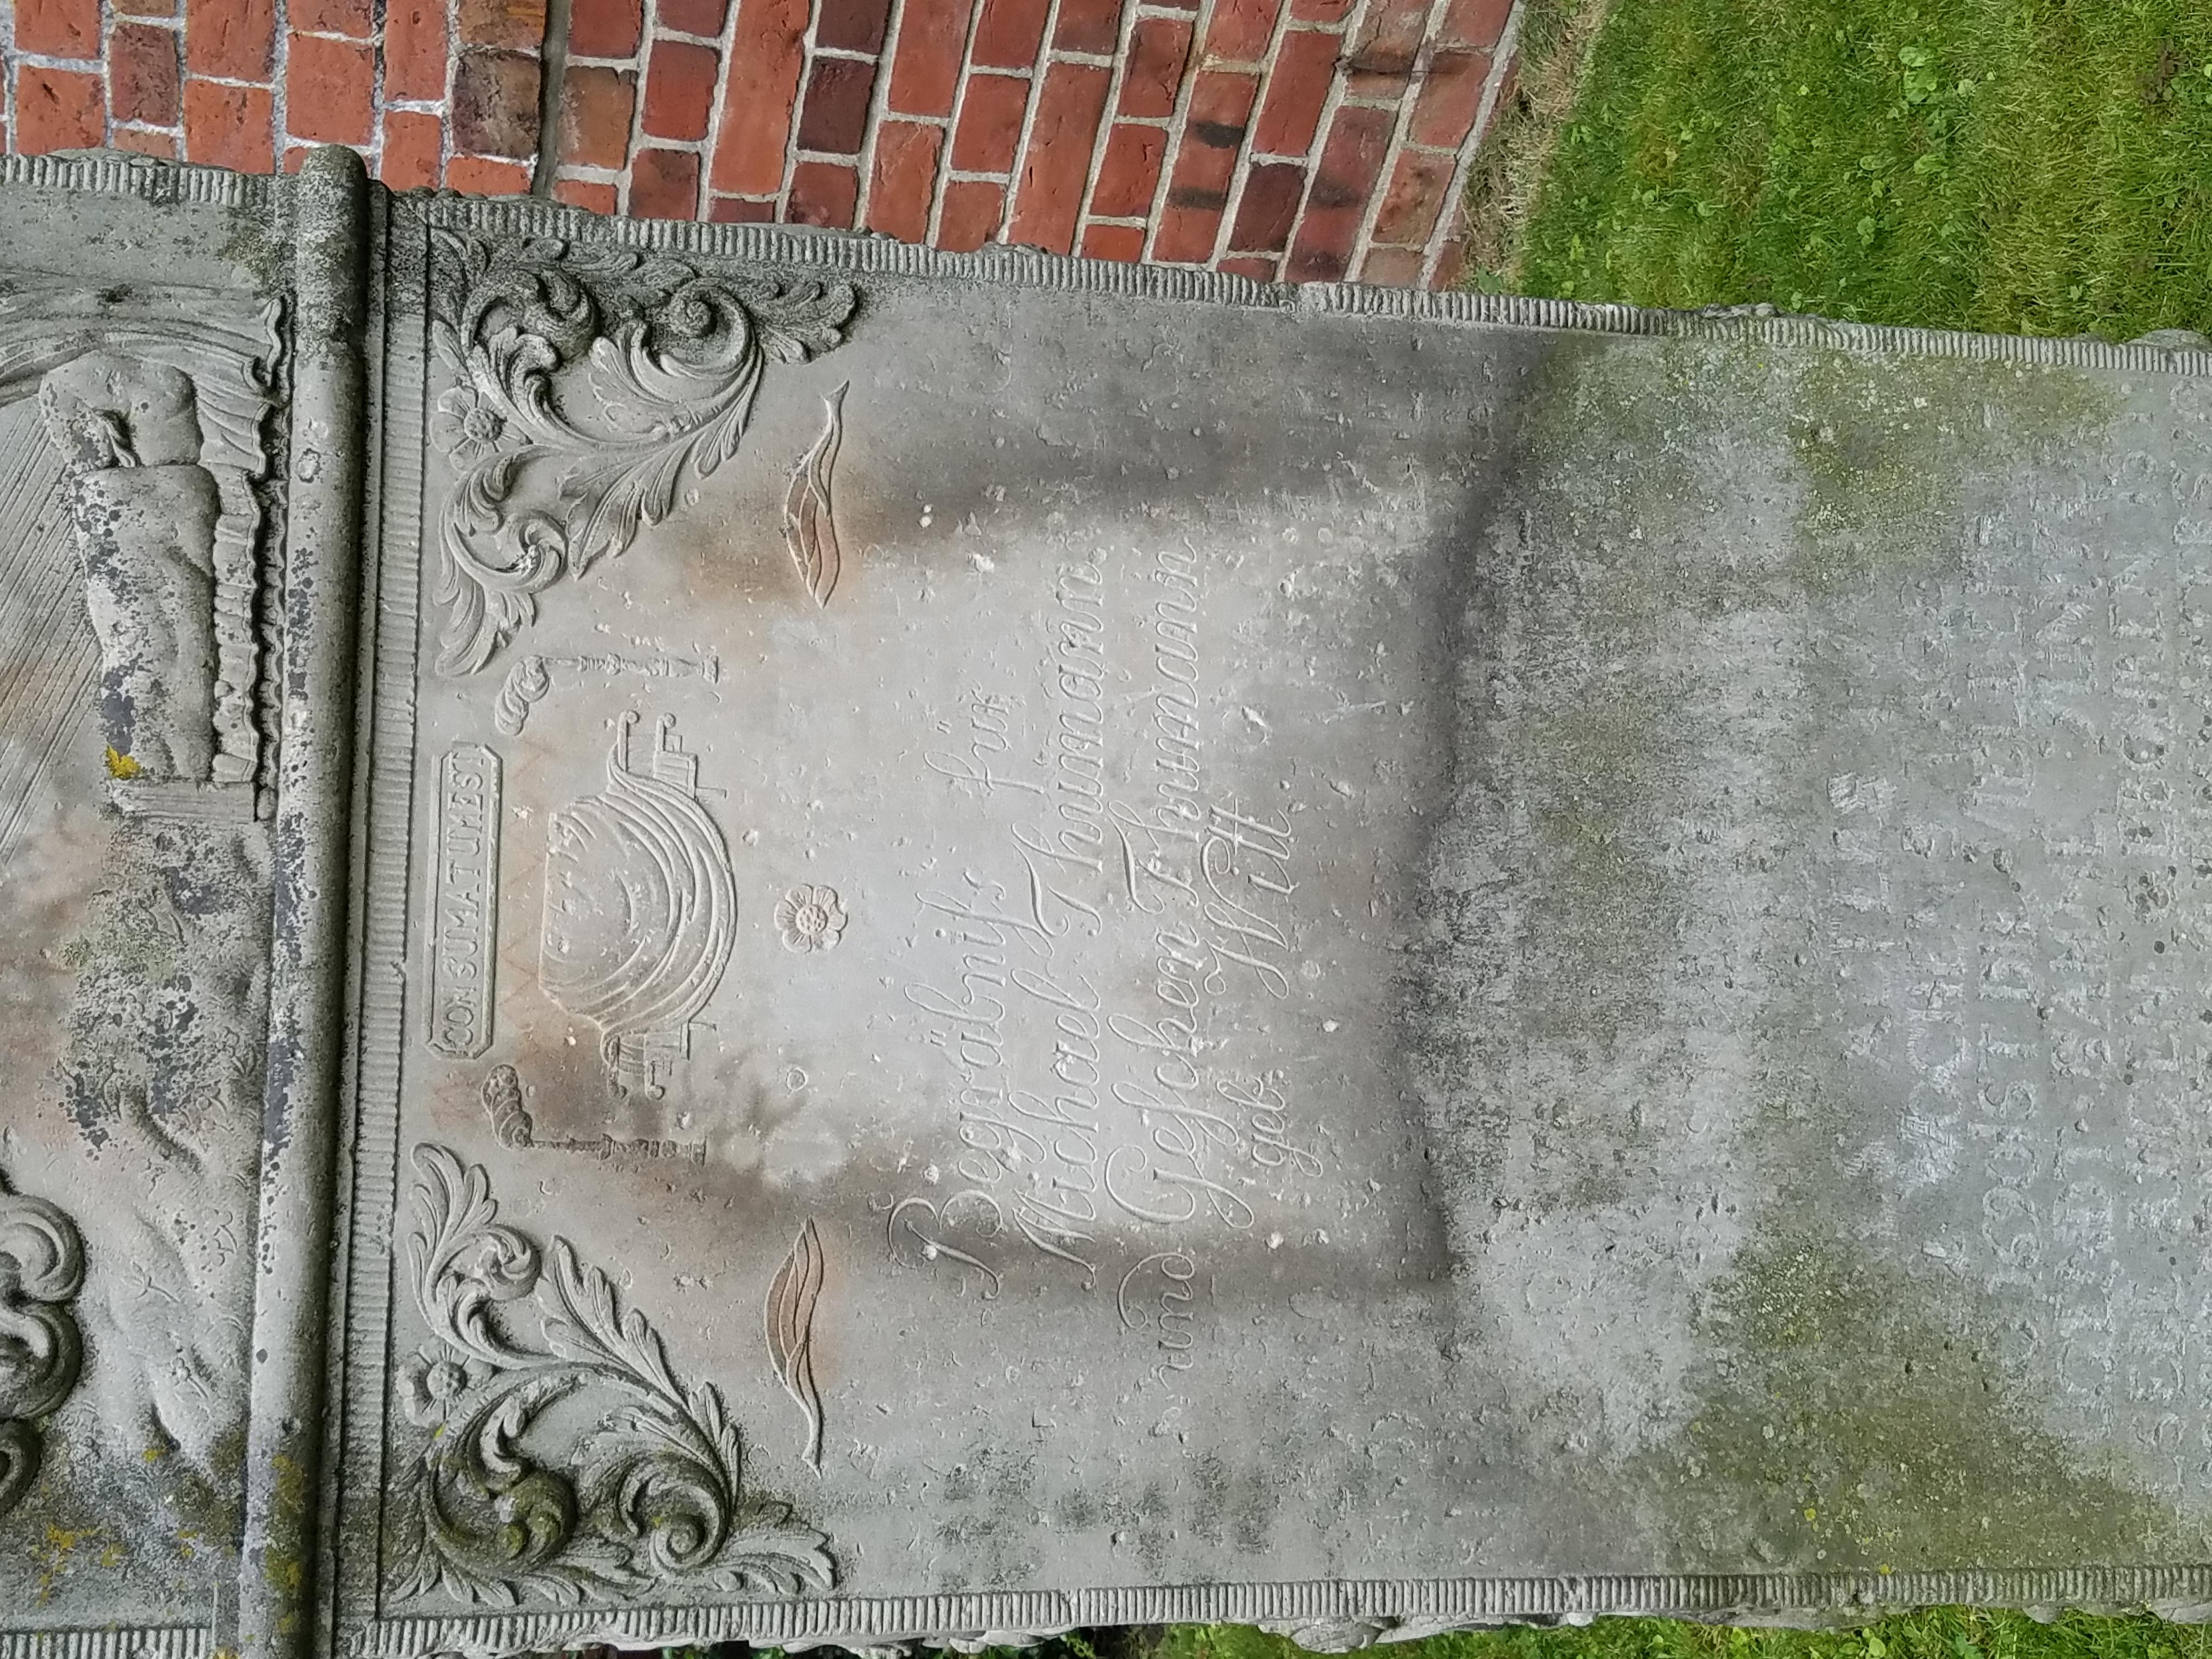 Johann Hermann Thumann